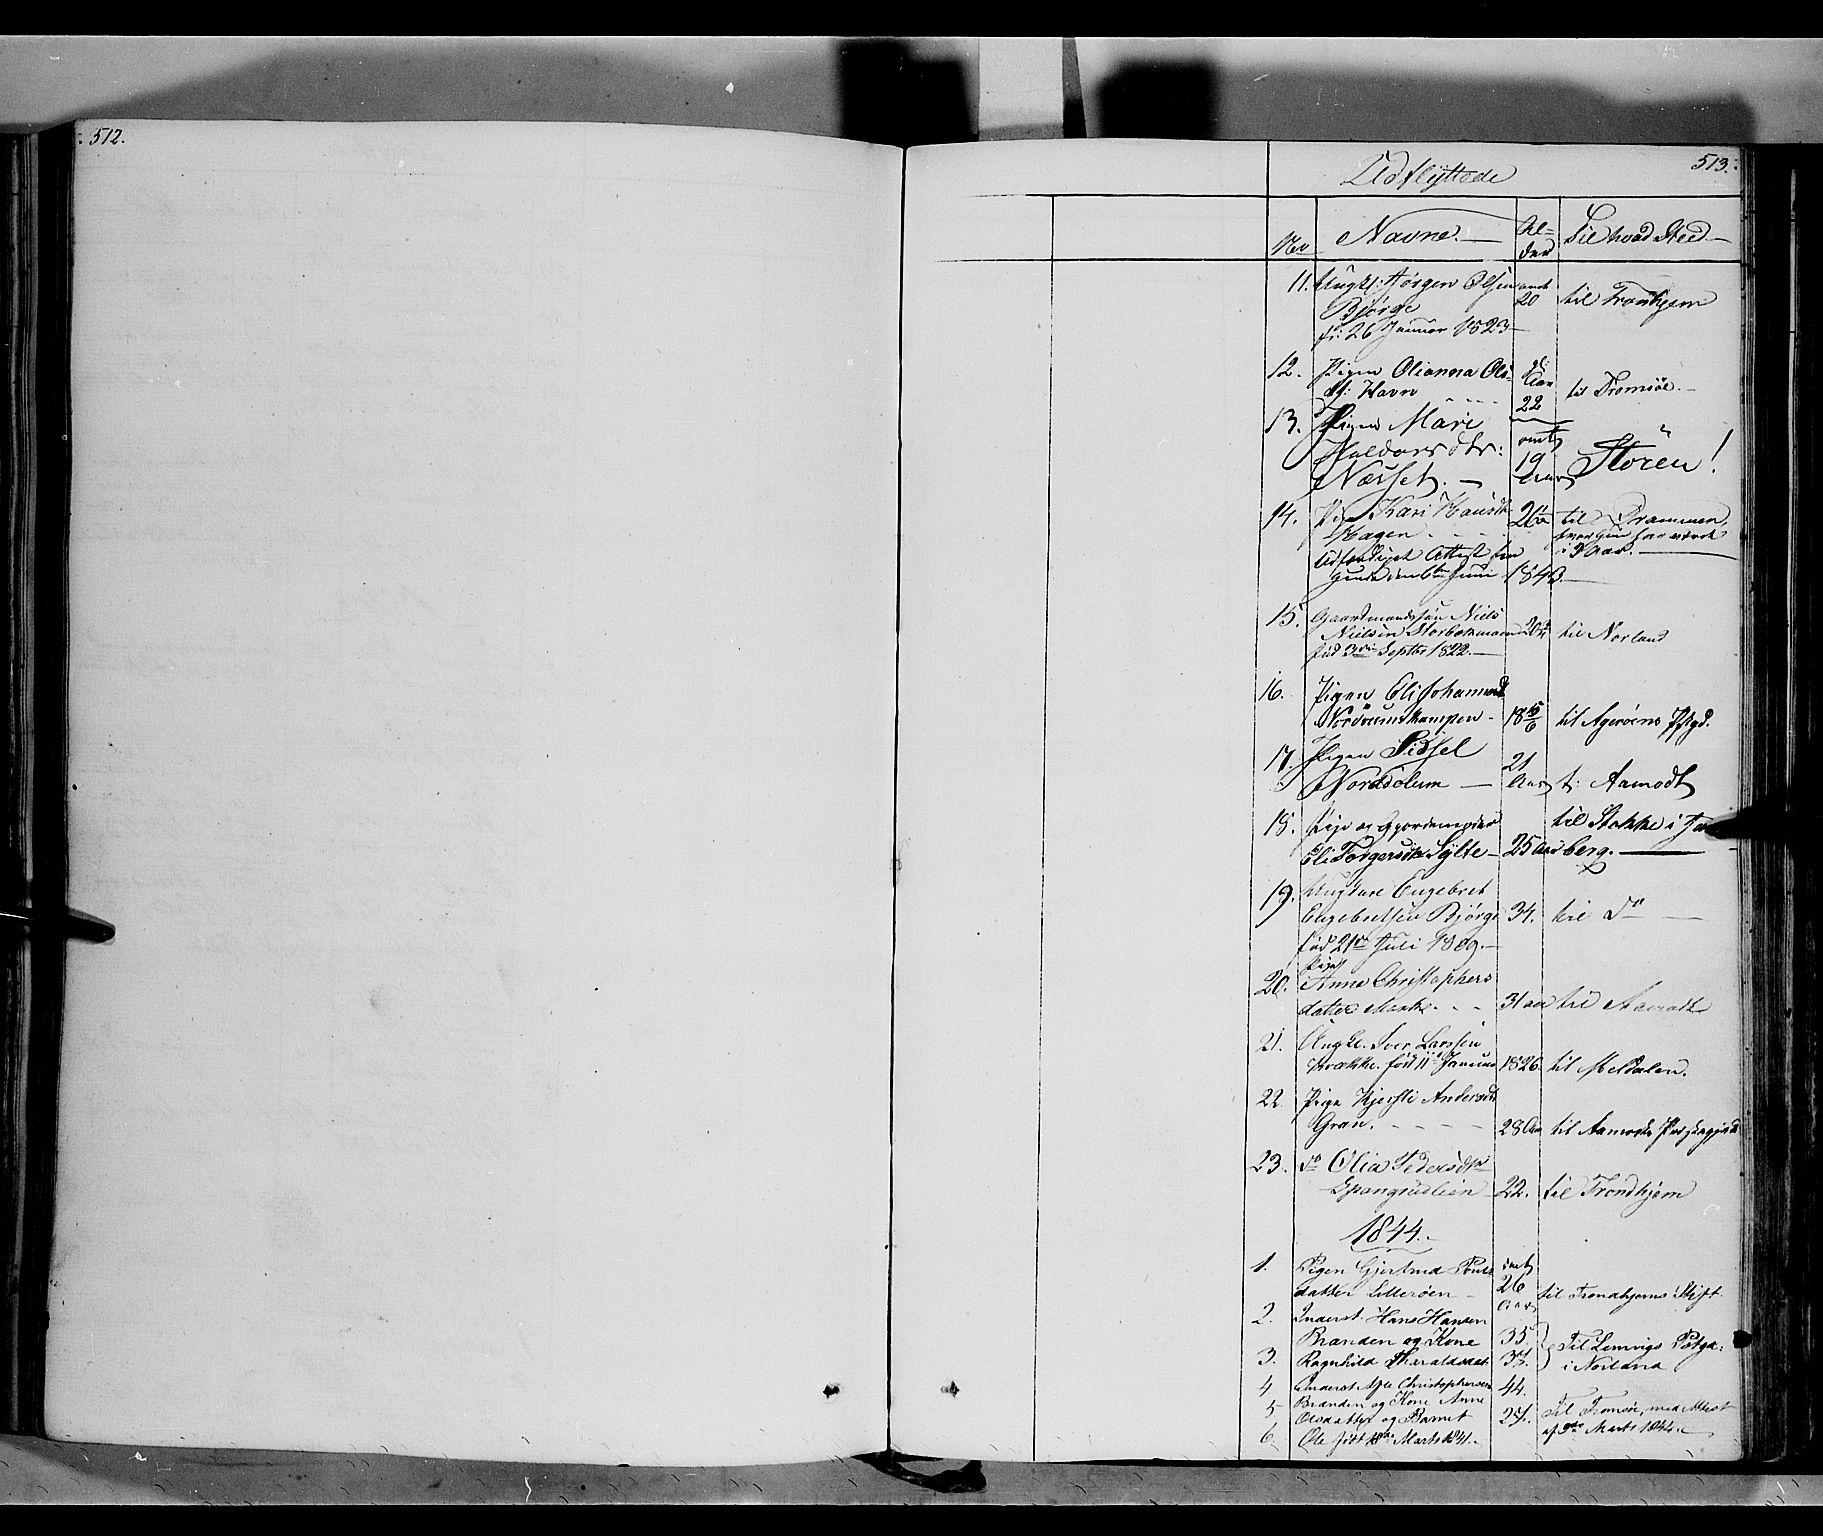 SAH, Ringebu prestekontor, Ministerialbok nr. 5, 1839-1848, s. 512-513